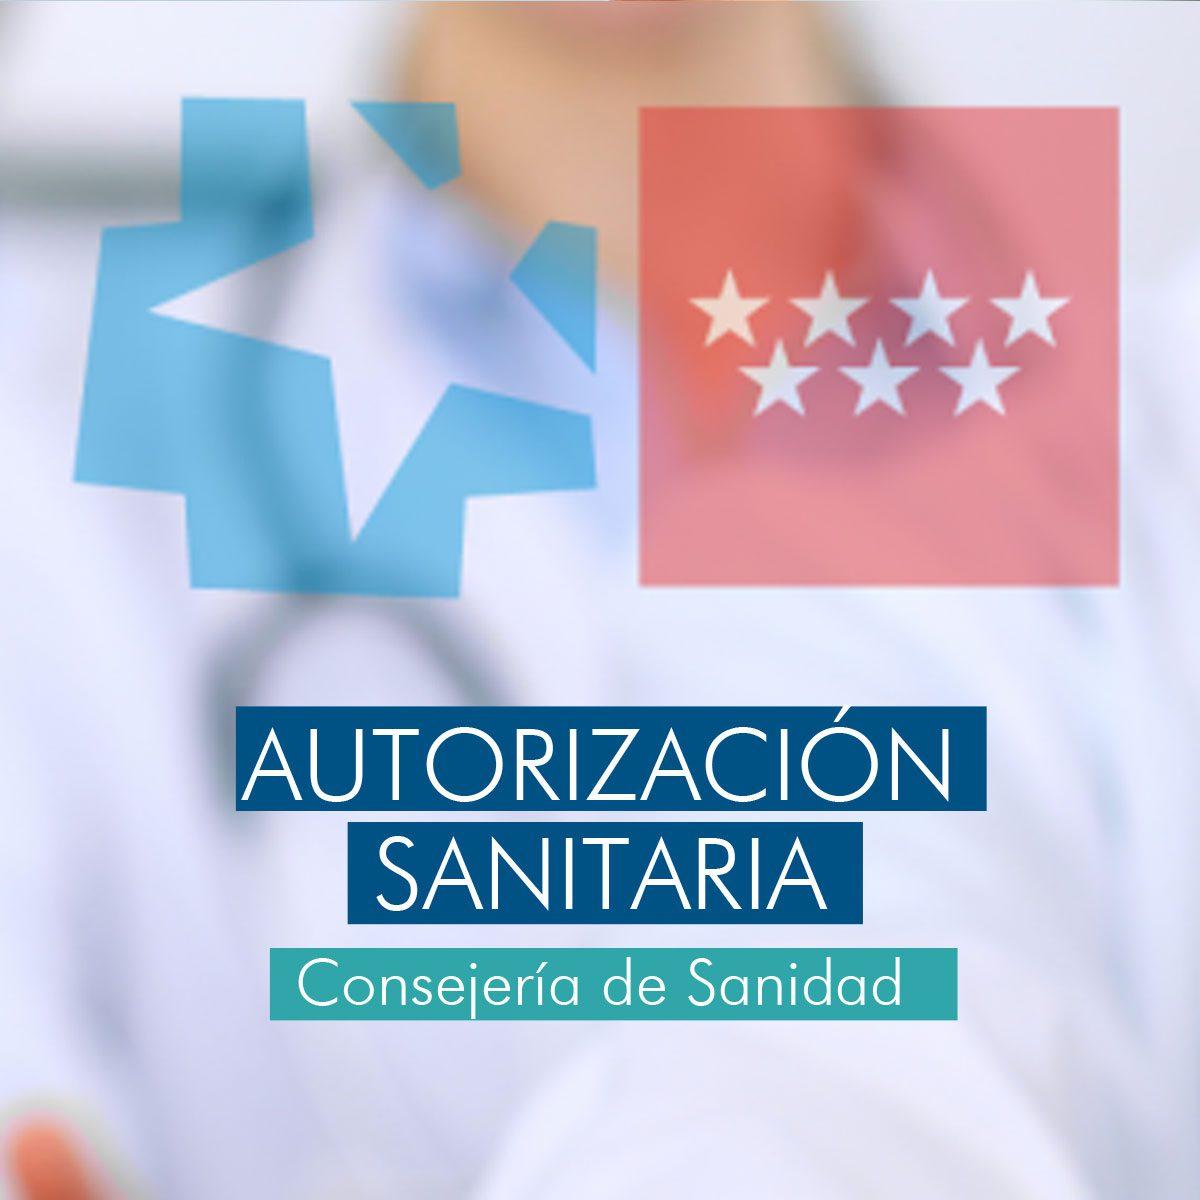 autorizacion-sanitaria-enfermeria-escolar